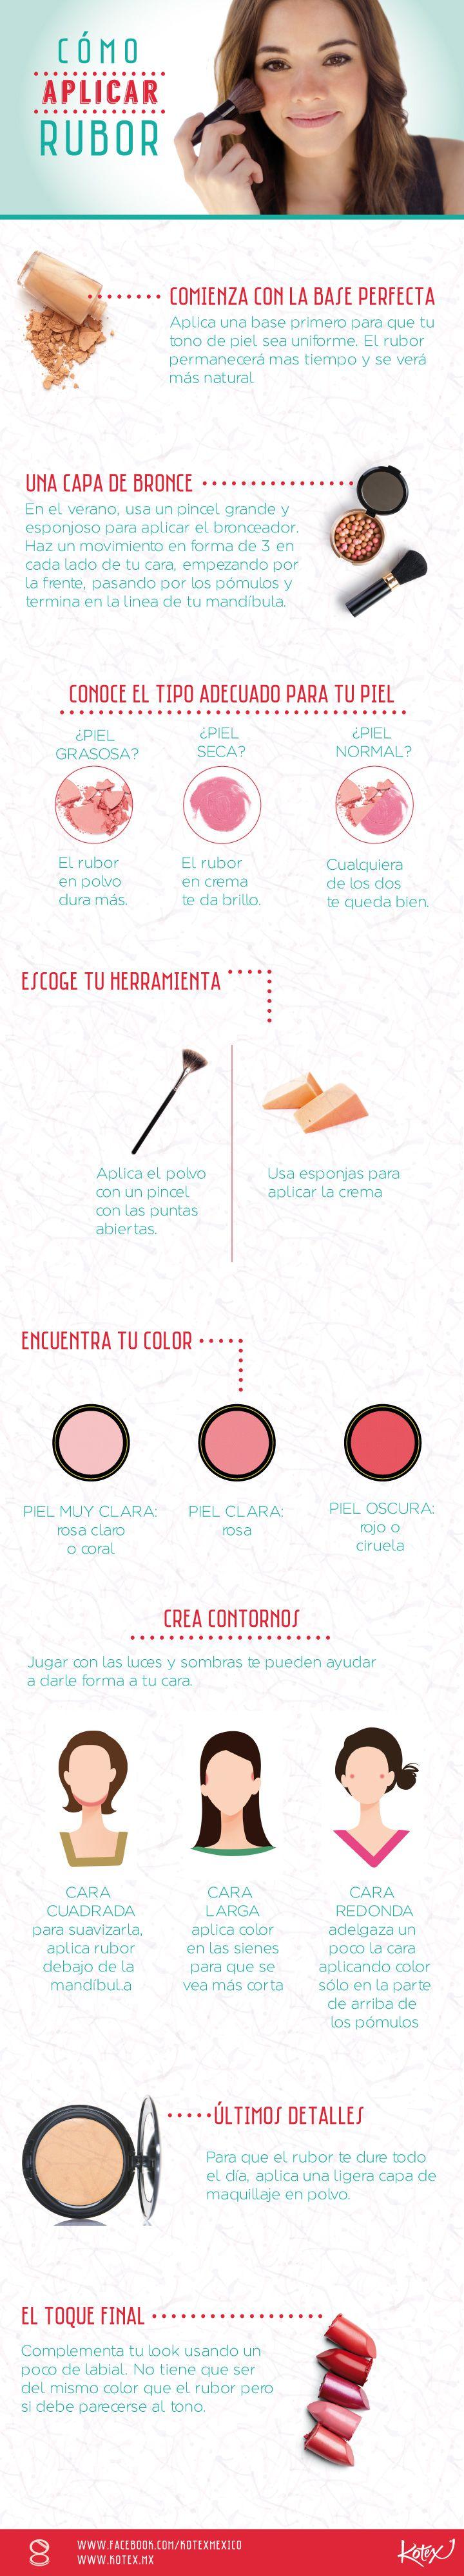 La técnica perfecta para aplicar el rubor, en una infografía. #Makeup #Belleza